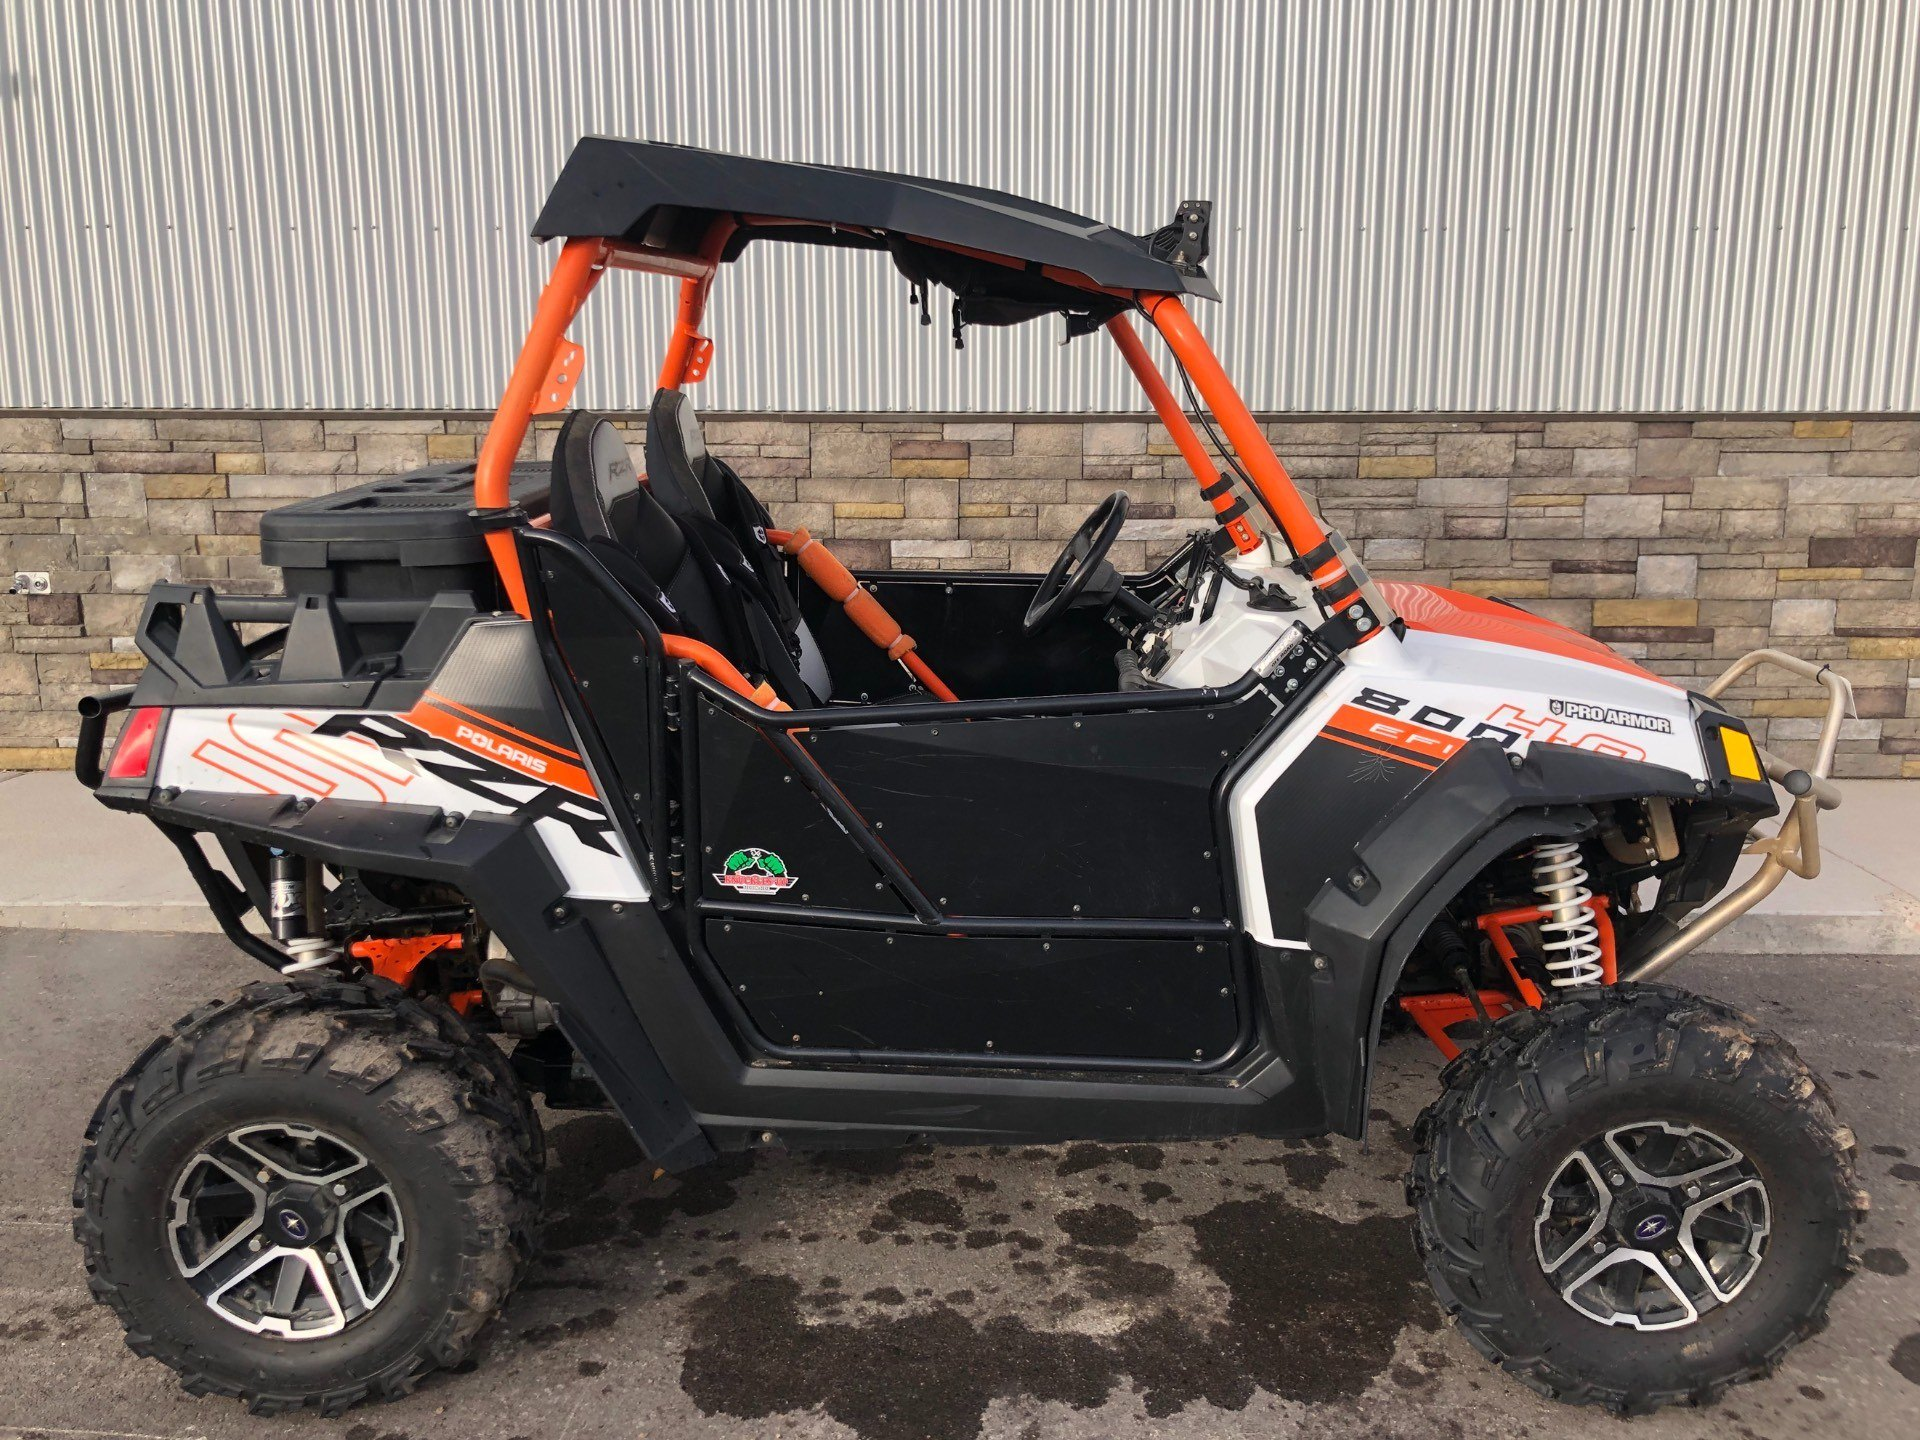 2013 Polaris RZR® S 800 LE in Rapid City, South Dakota